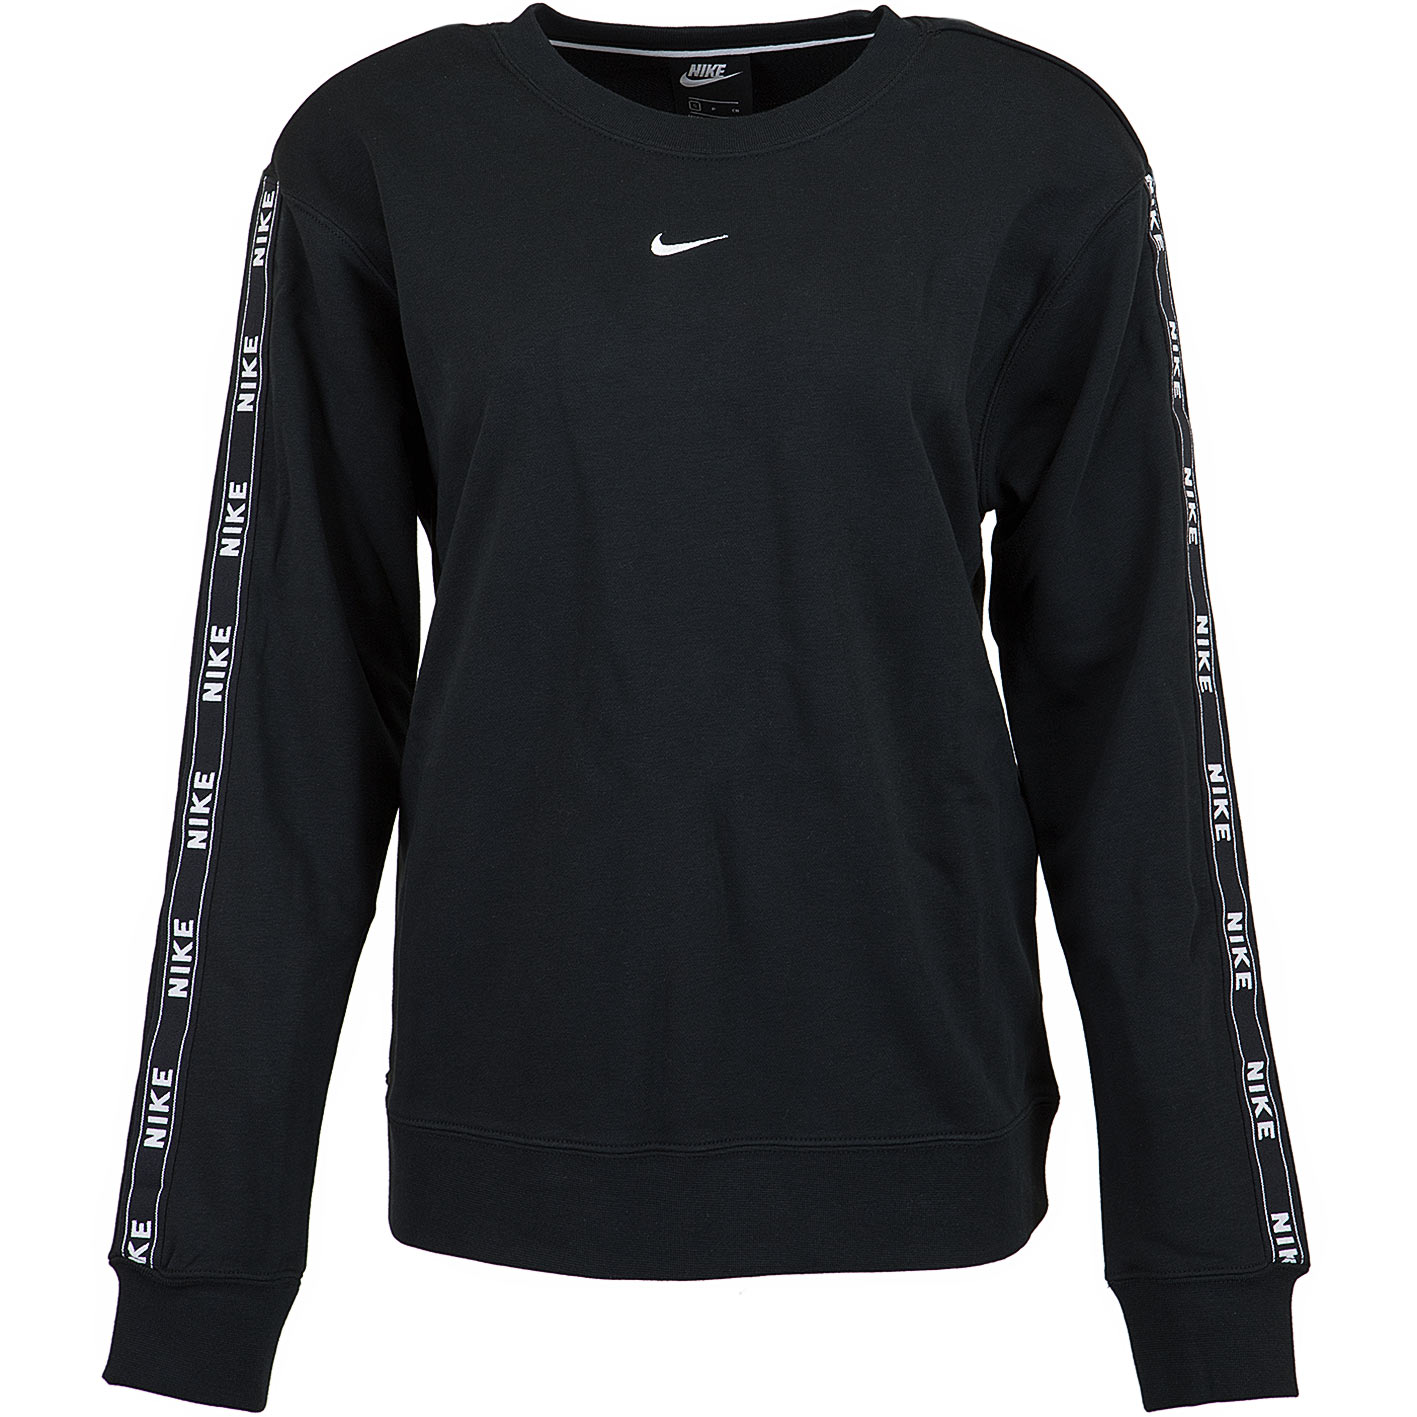 low priced a02fe 53f73 Nike Damen Sweatshirt Logo Tape schwarz/weiß